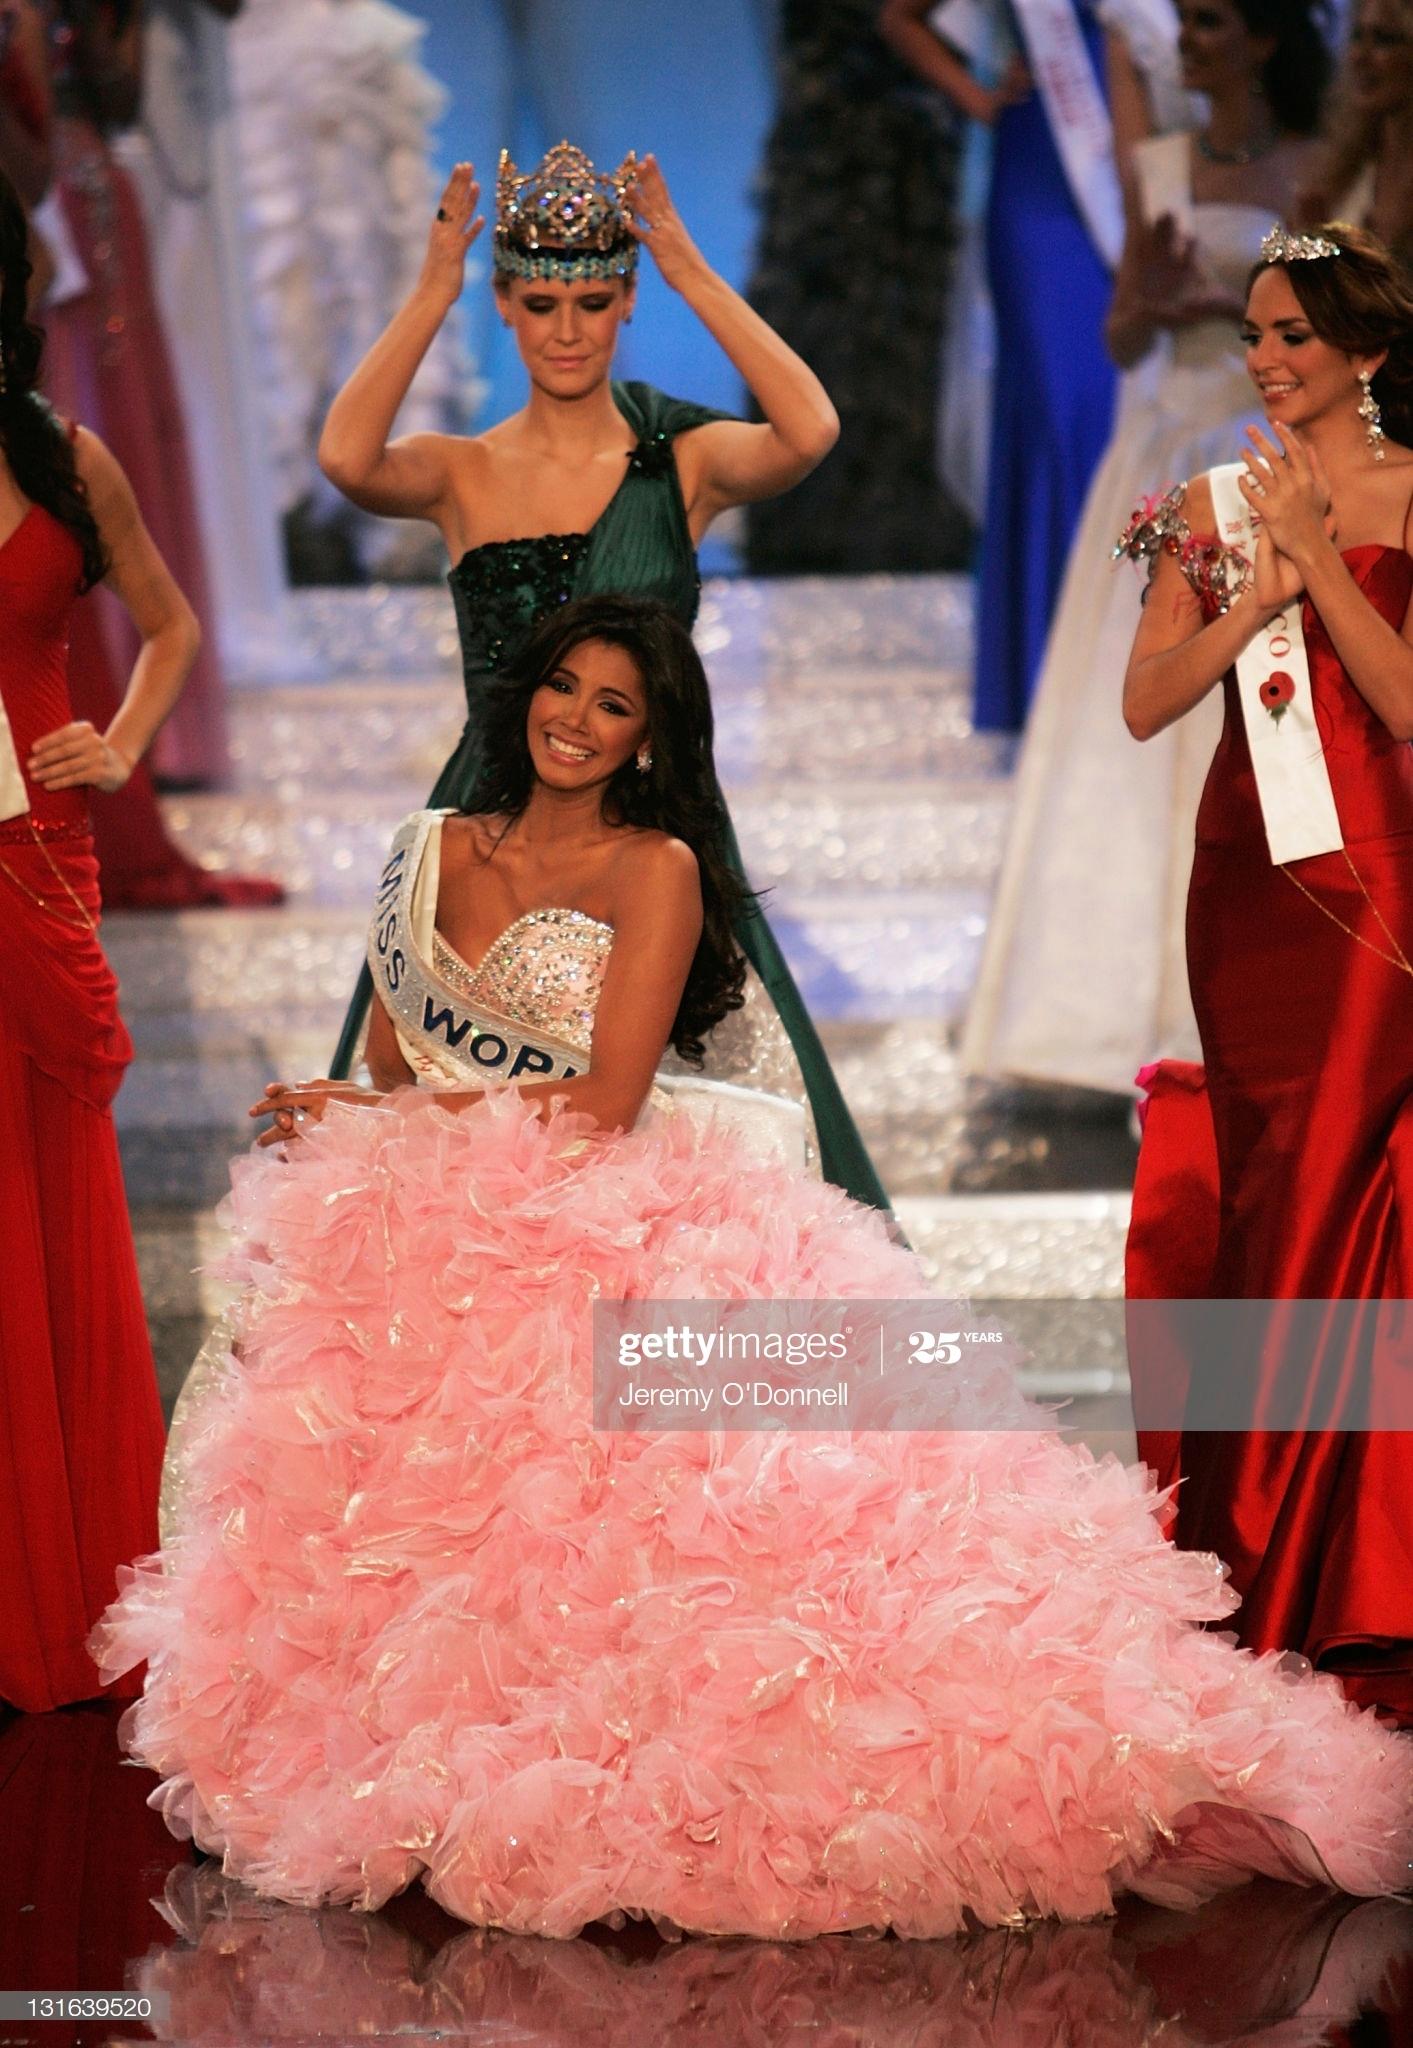 alexandria mills, miss world 2010. - Página 7 Miss-v18